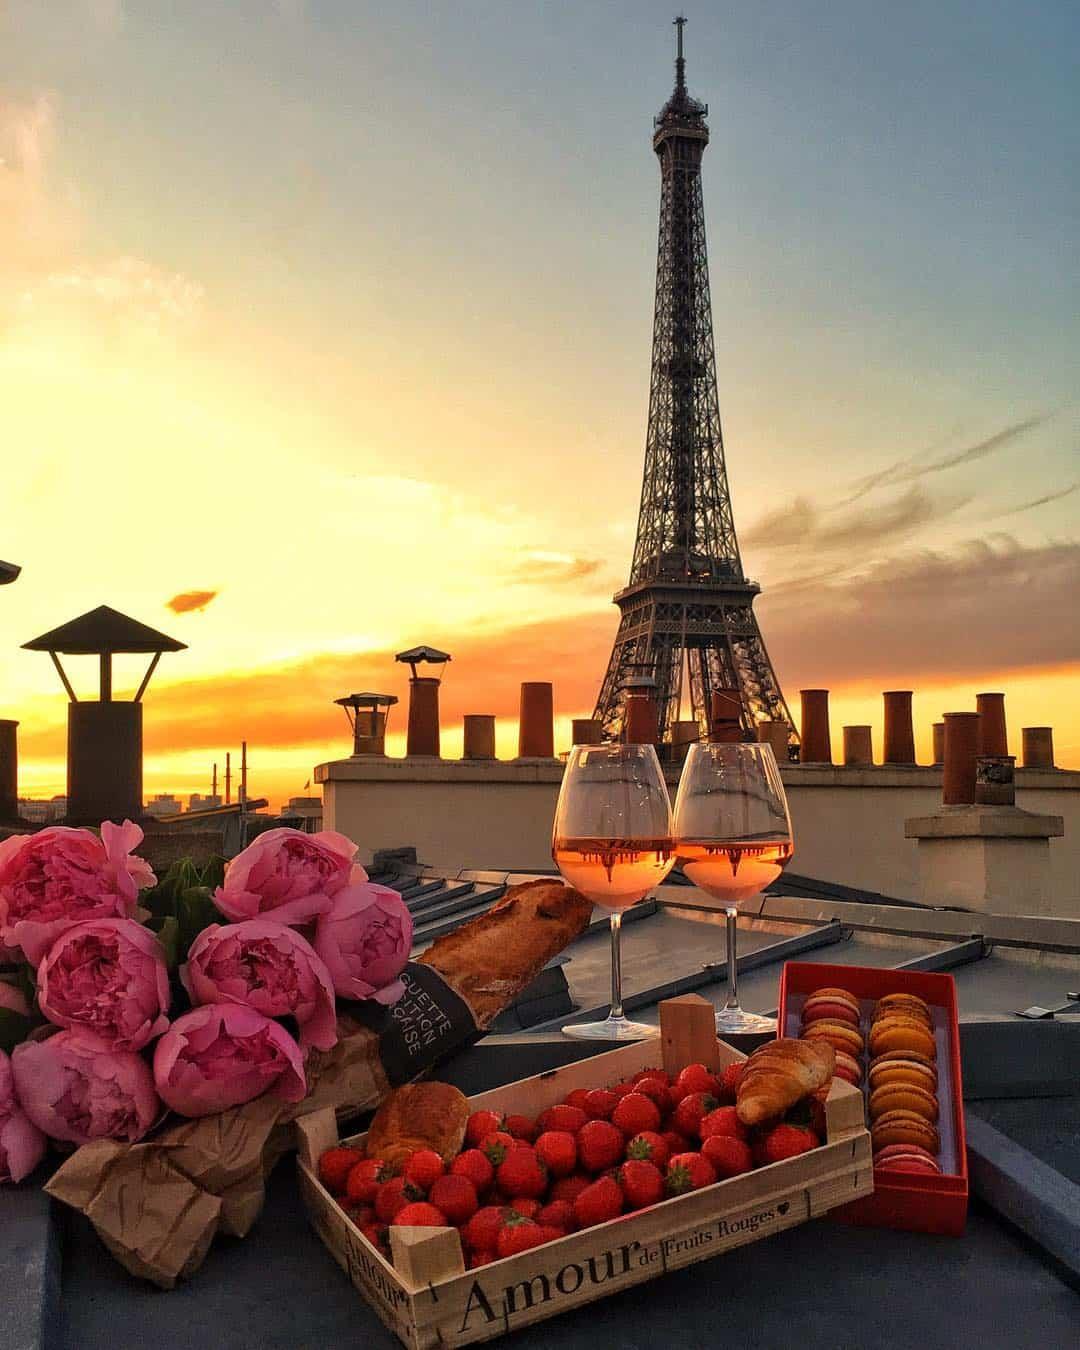 Best Rooftop Views in Paris of the Eiffel Tower